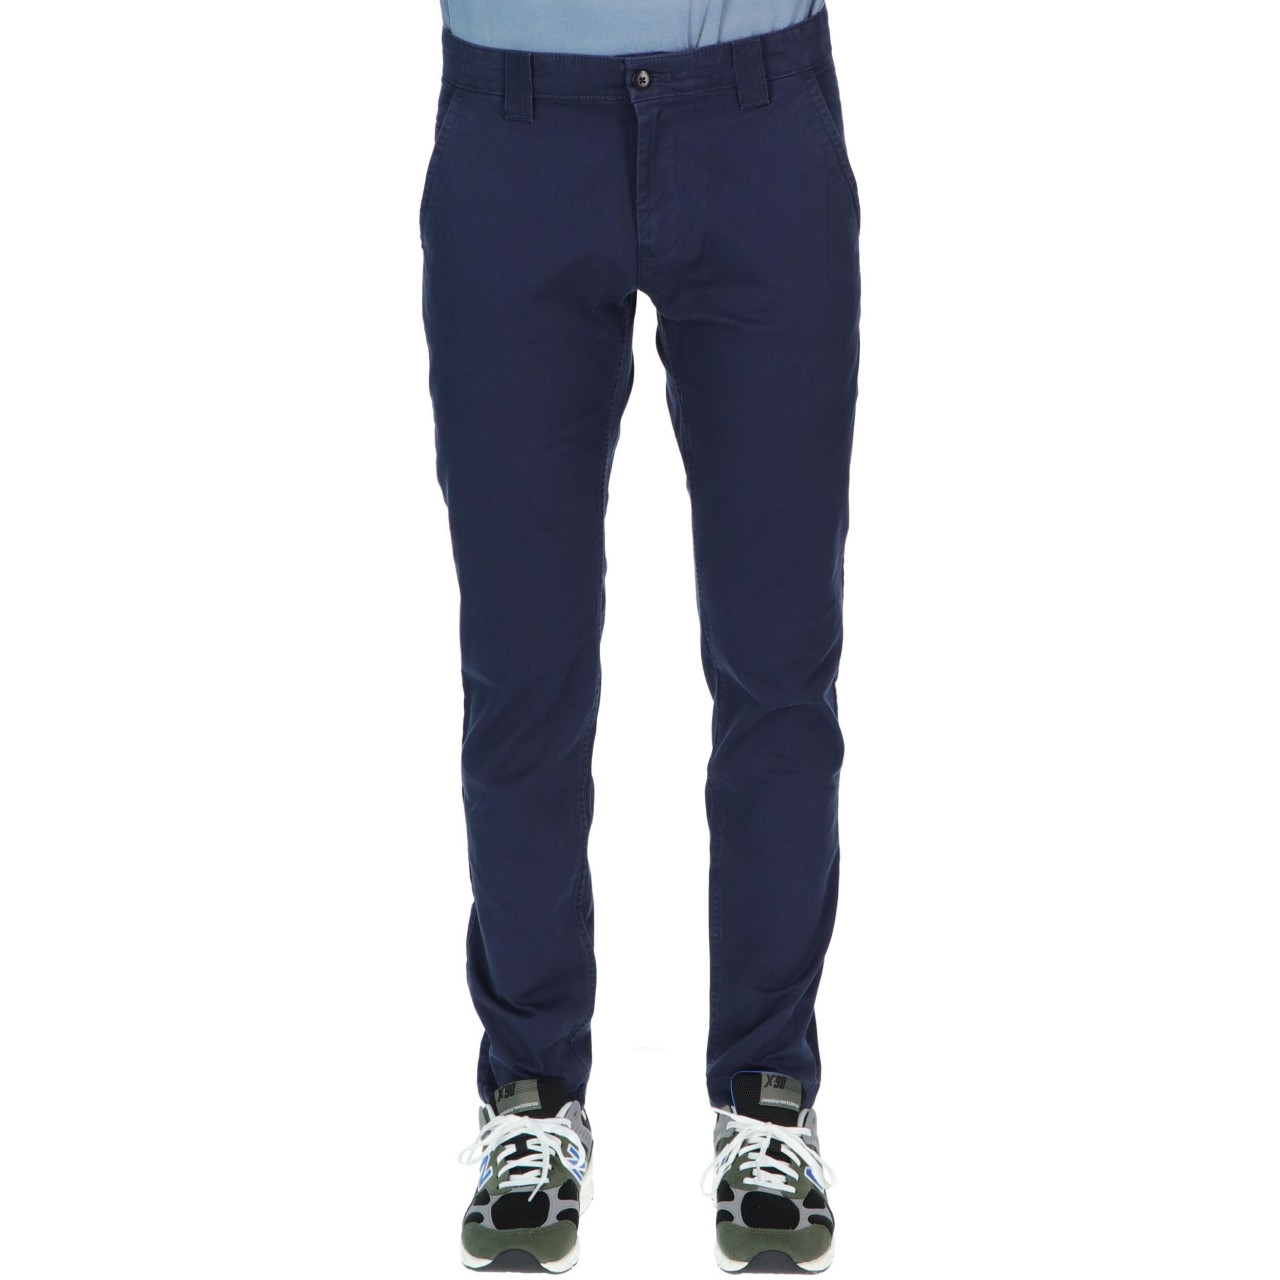 Tommy hilfiger Uomo Pantalone Tommy Jeans Uomo Scanton Cotone Chino Slim 06518M